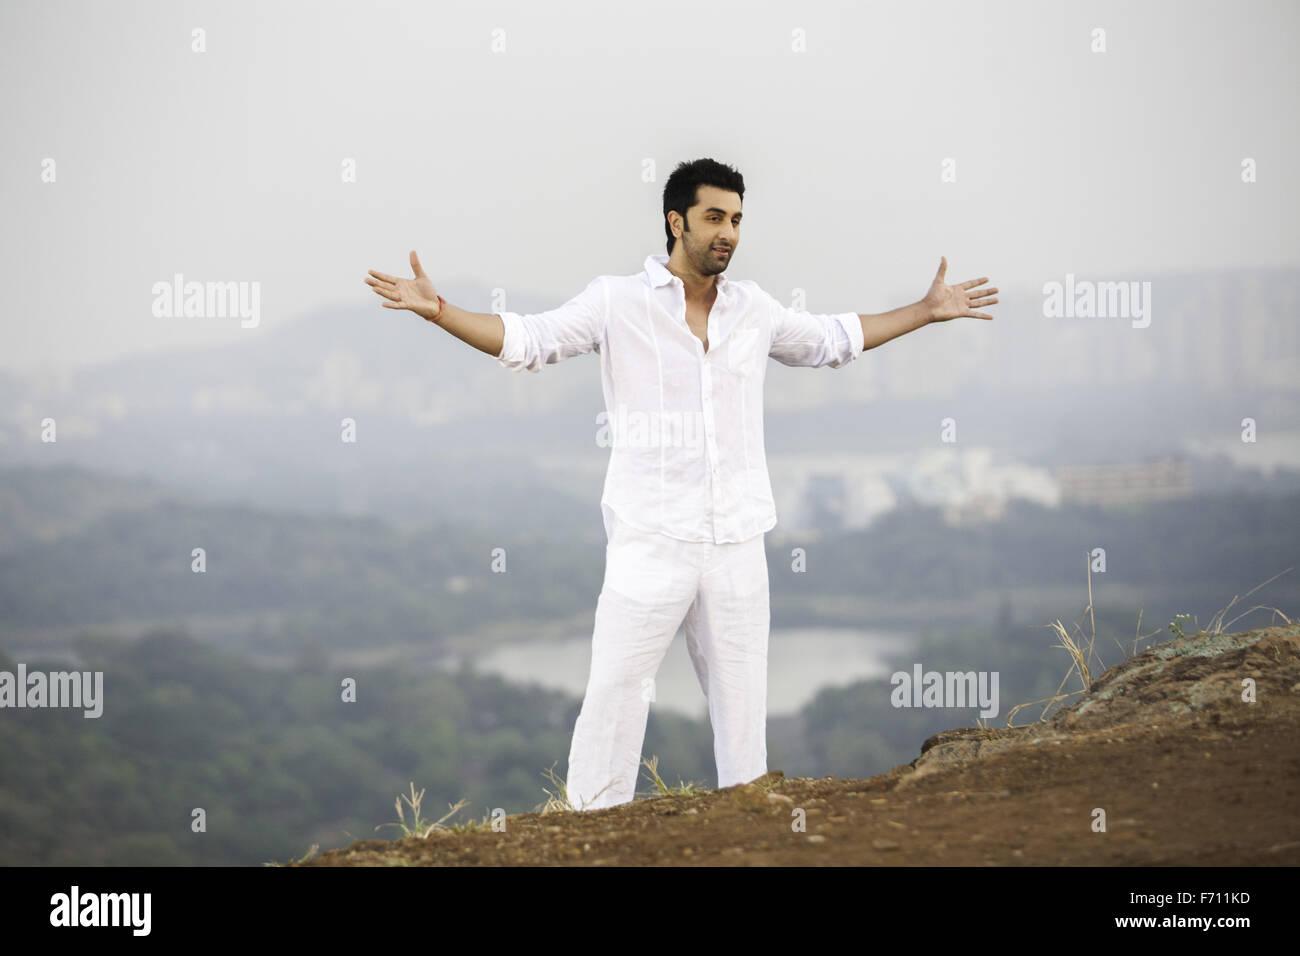 Indian bollywood films actor ranbir kapoor, india , asia - Stock Image